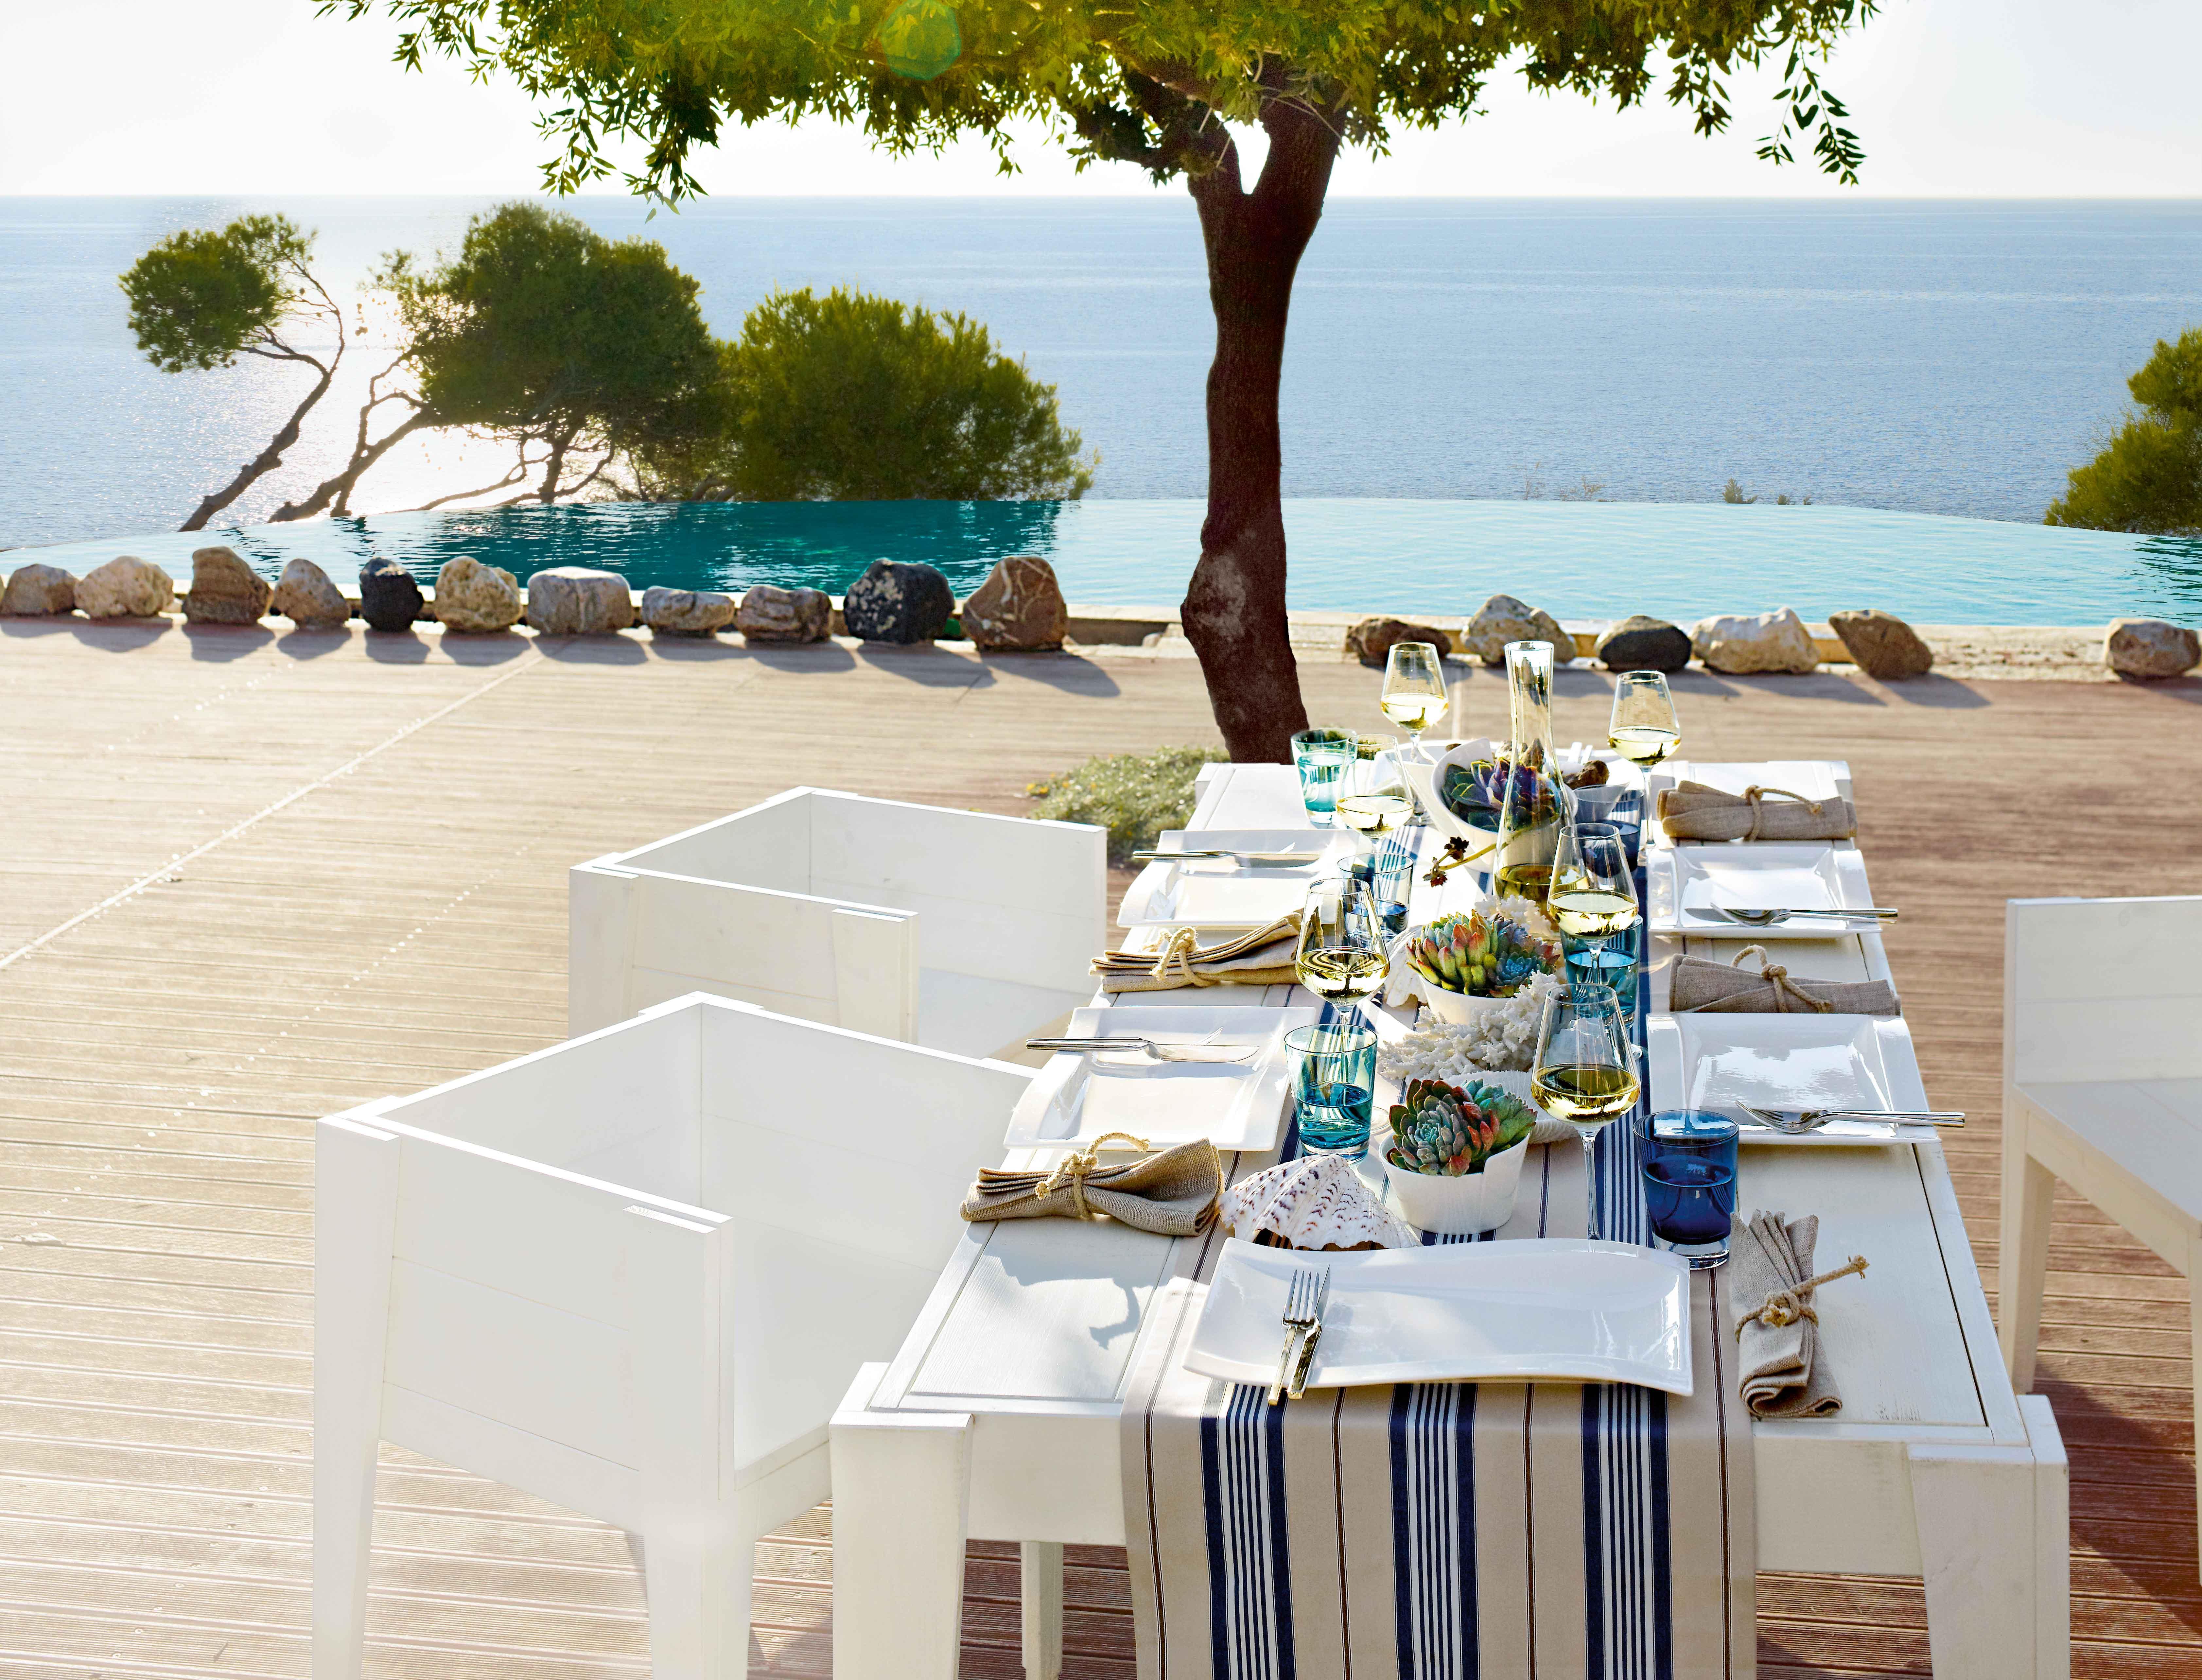 Villeroy & Boch tableware on outdoor dining table